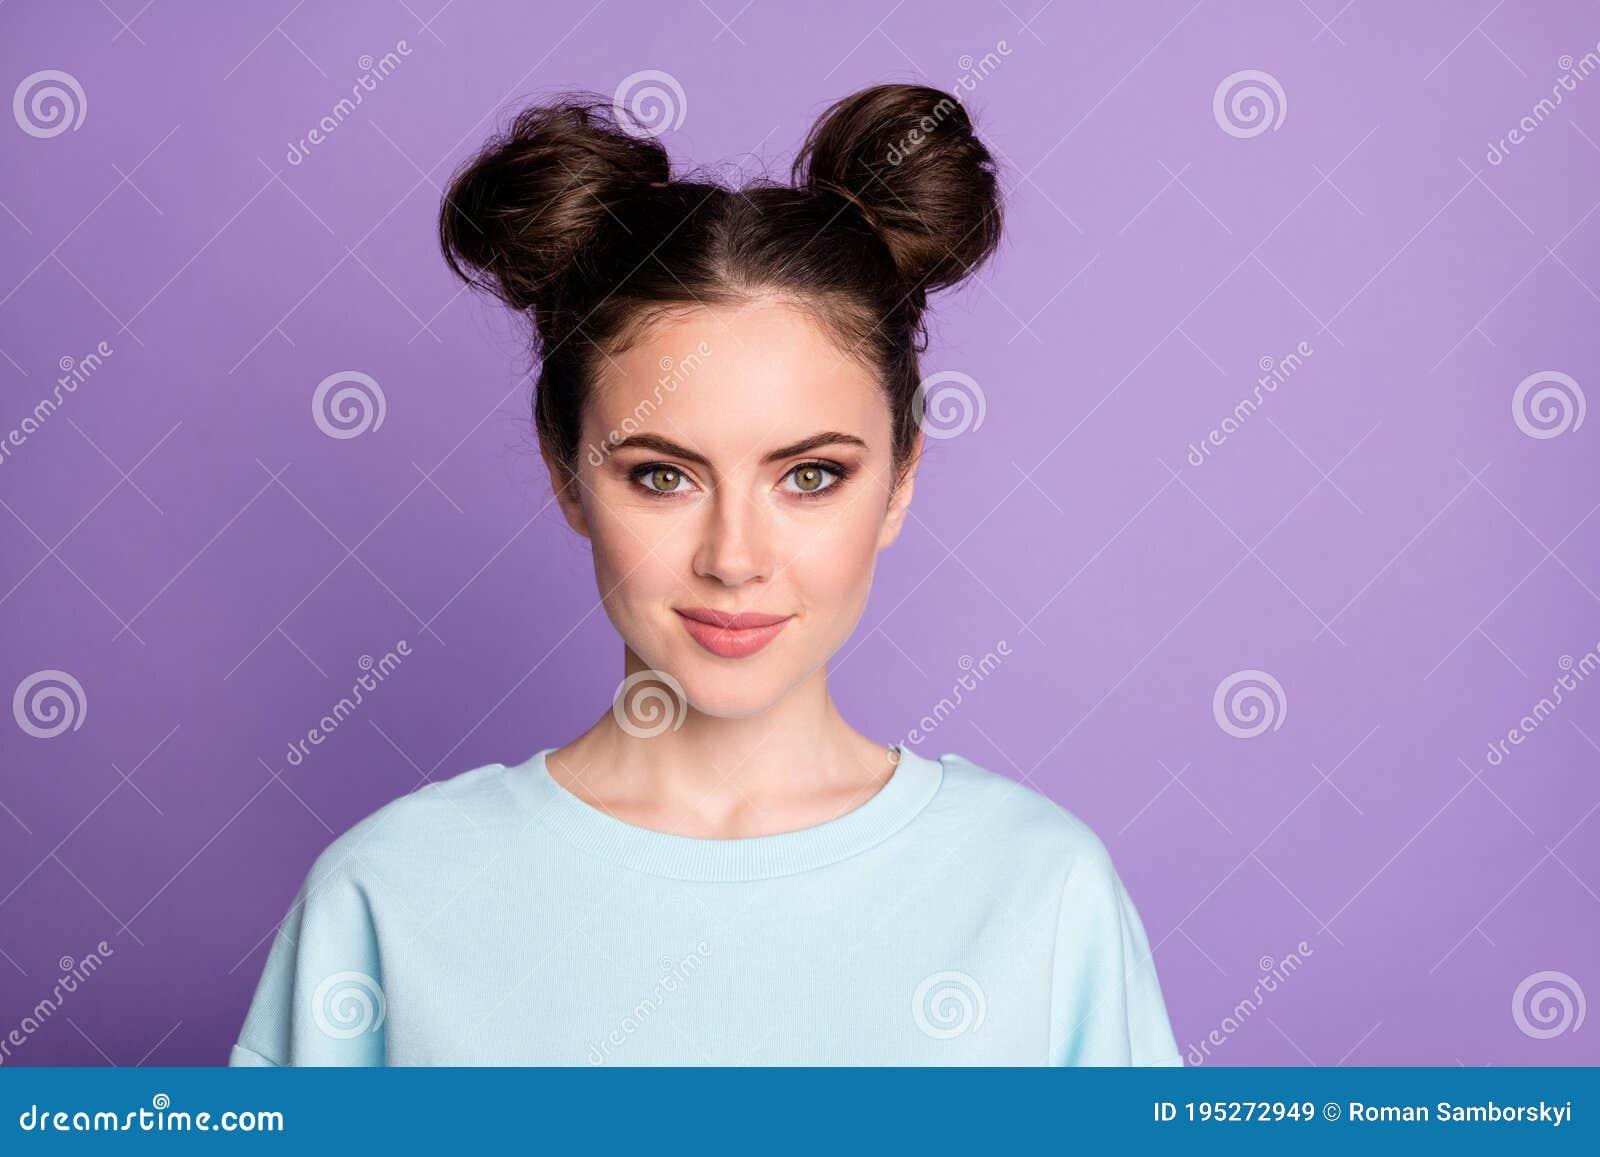 Portrait Of Nice Sweet Girl Freelancer Feel Confident Look